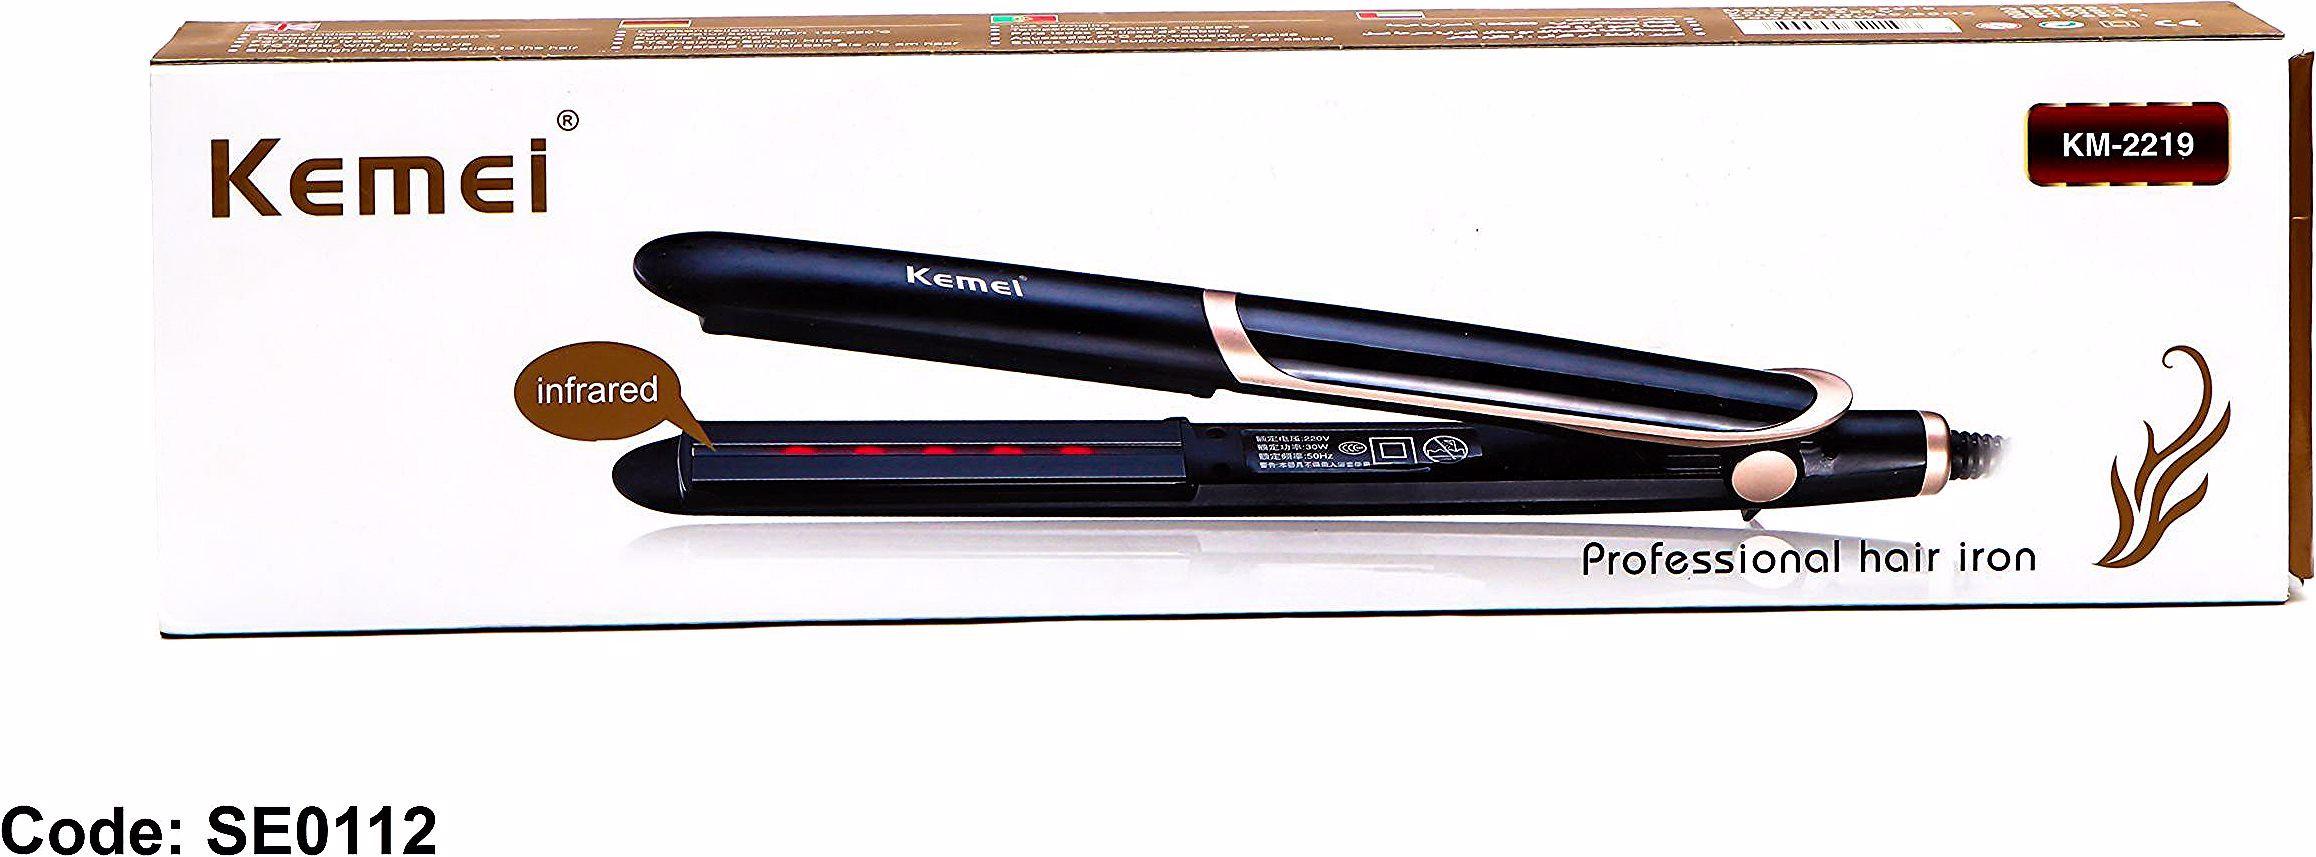 Kemei Km2219 مكواة الشعر بسعر 200ج بدل من 270ج مكواة تصفيف الشعر سيراميك تتميز بالتحكم في درجات ا Professional Hair Iron Professional Hairstyles Lip Liner